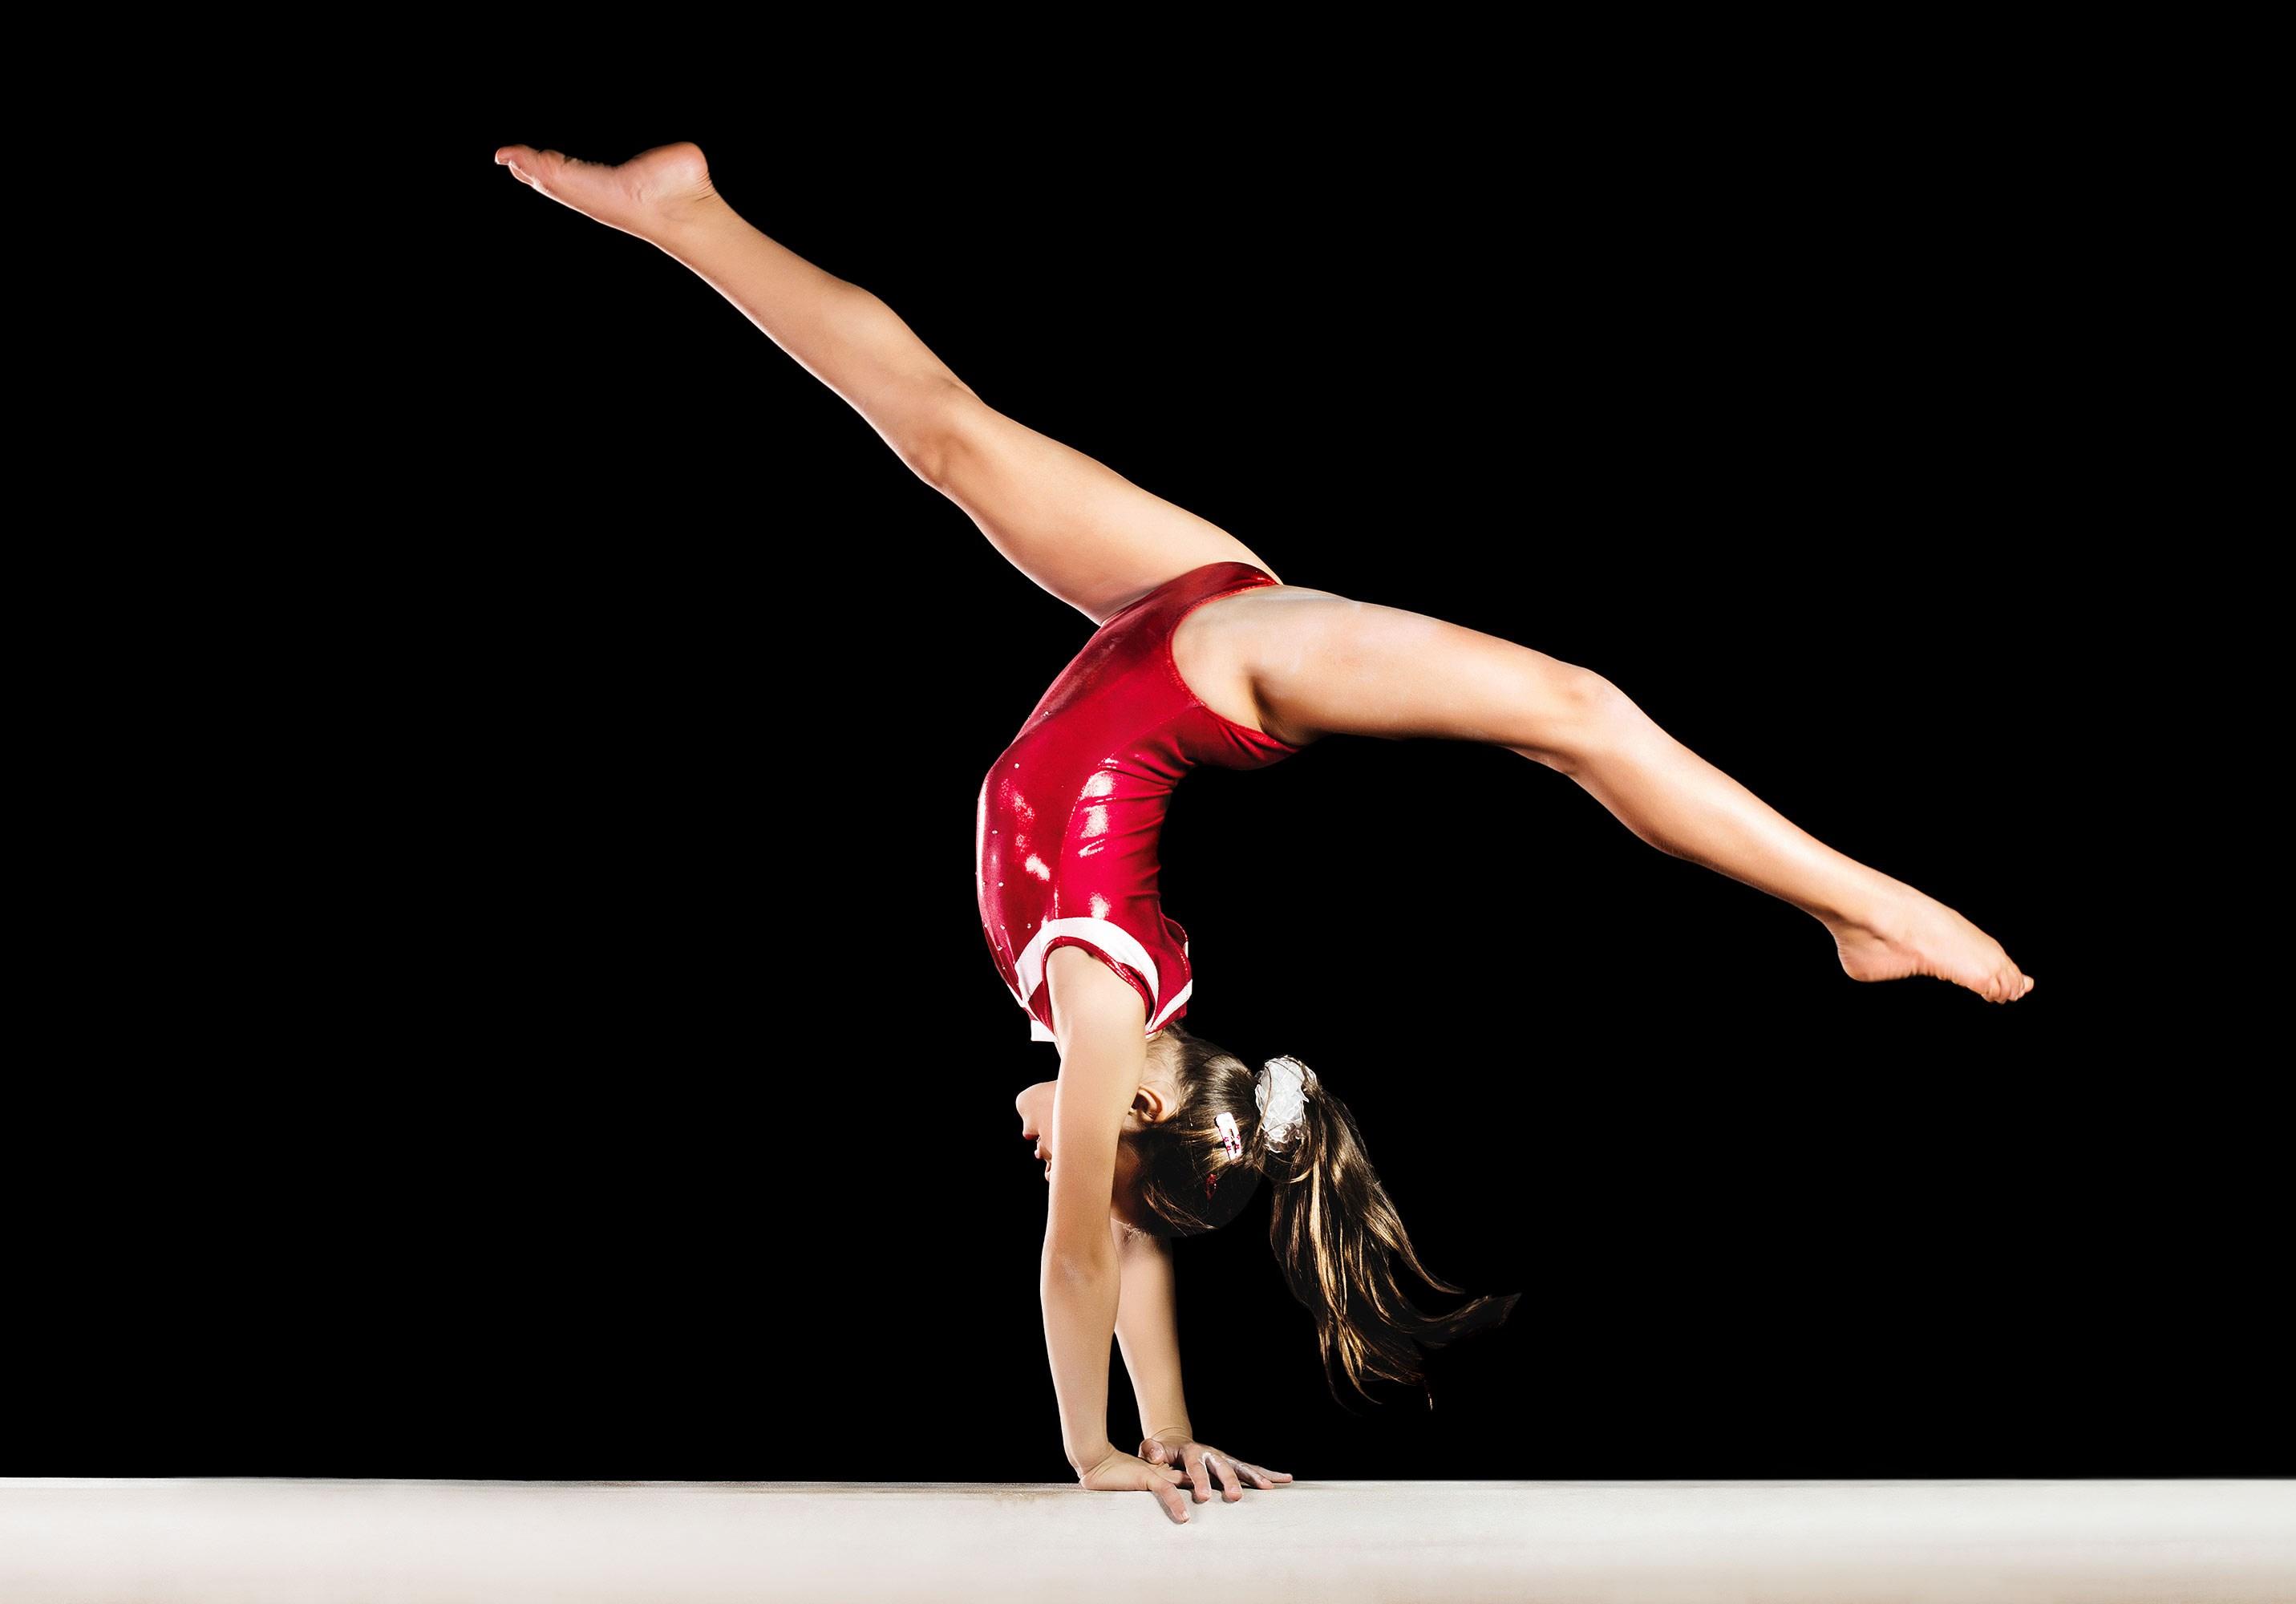 младенчестве она видео гимнастика девушки догадалась, что она